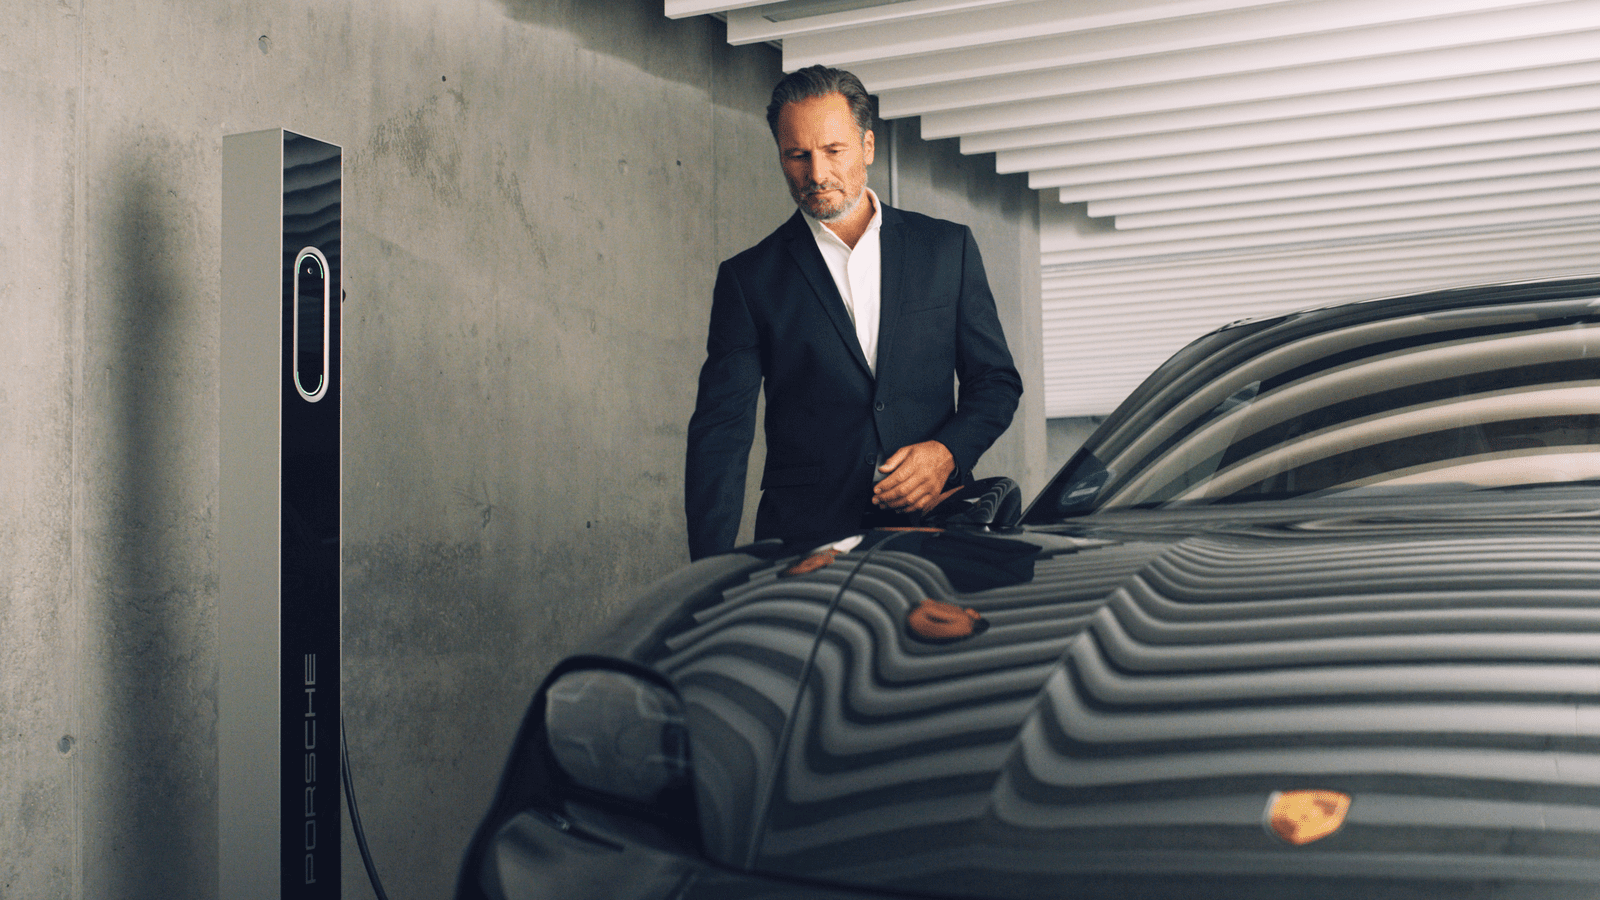 Stuttgart Filmproduktion Porsche Taycan TEQ Charging Andre Danke an der Ladesäule